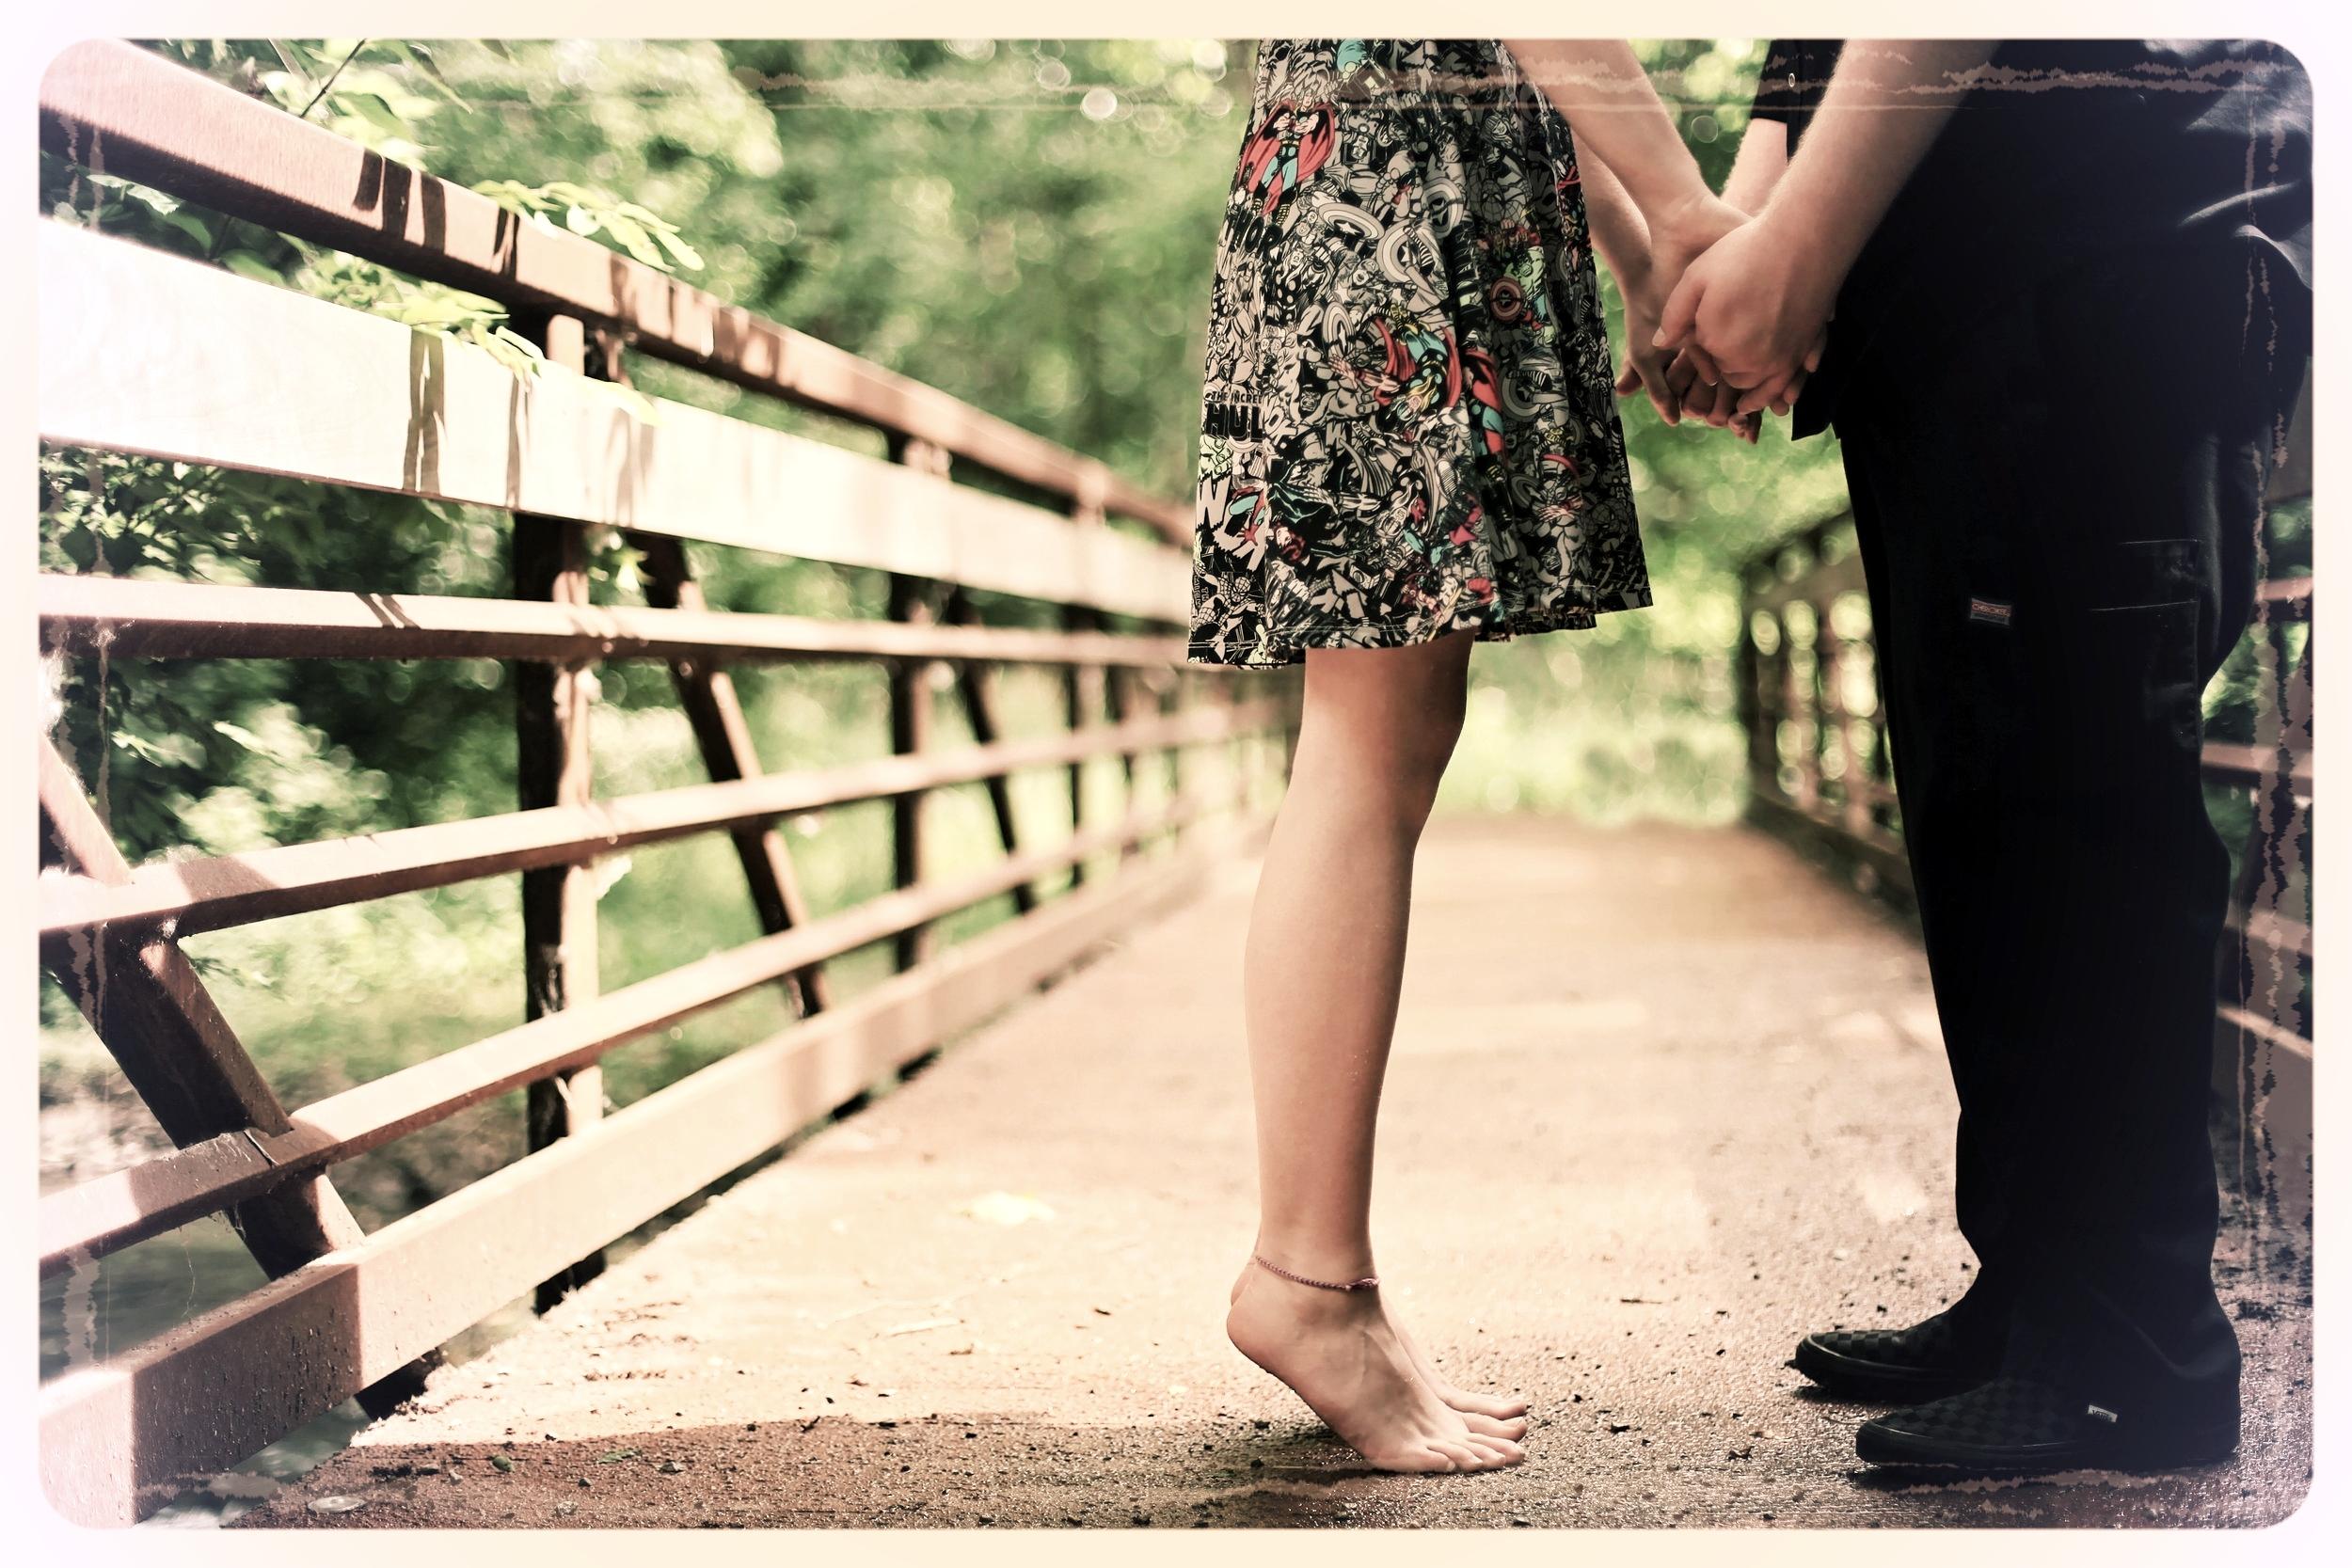 adult-barefoot-blur-618916.jpg